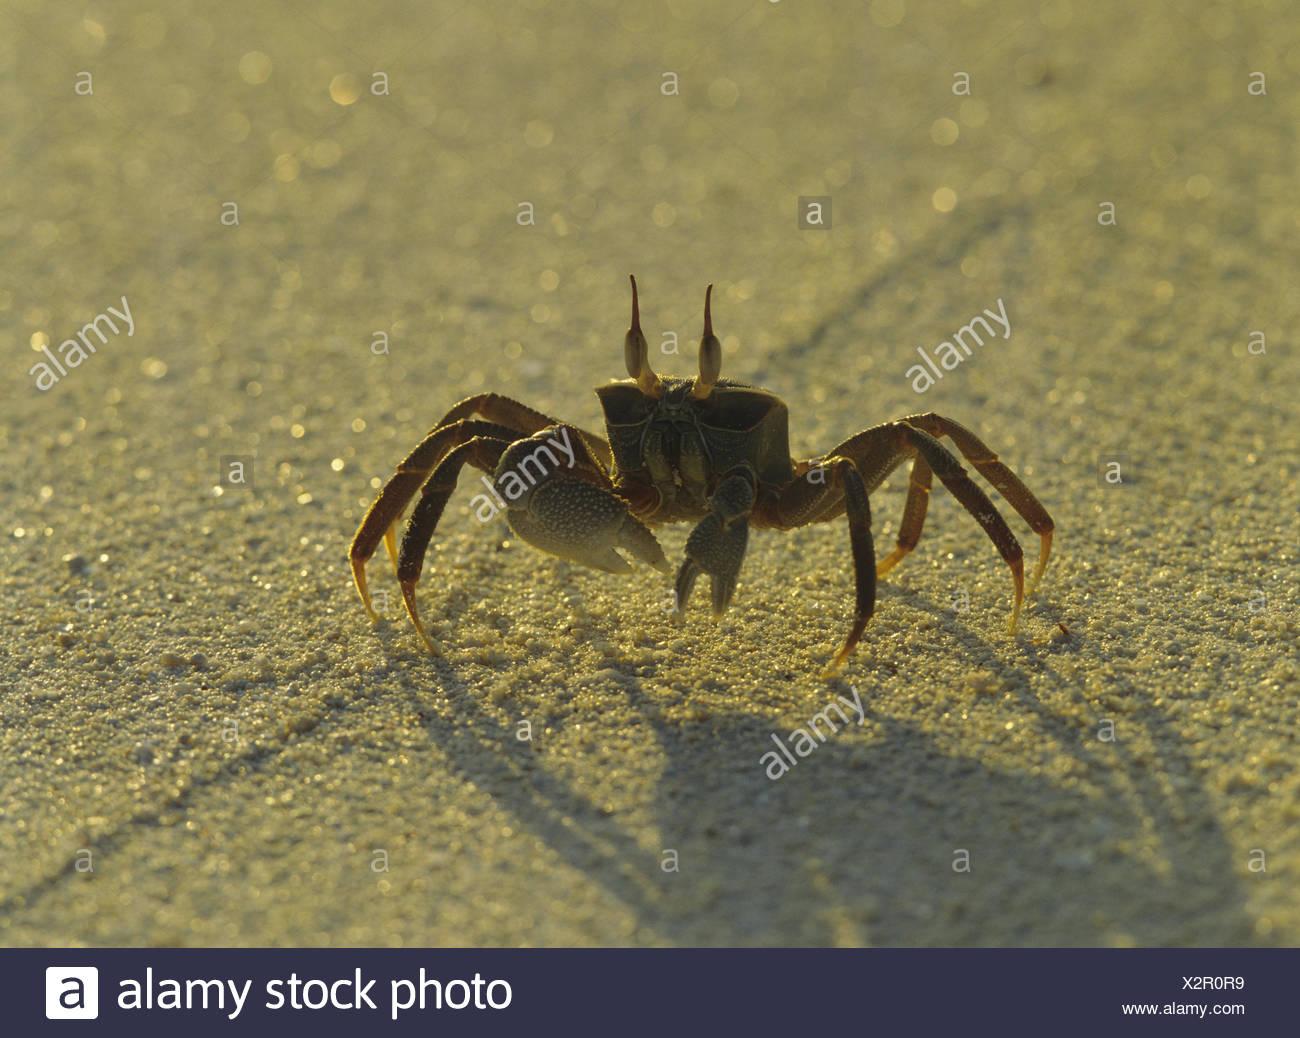 Beach, mind crab, Ocypode spec., Sand, sandy soil, animal, crab, wild animal, mind crab, ghost's crab, light, shade, Stock Photo